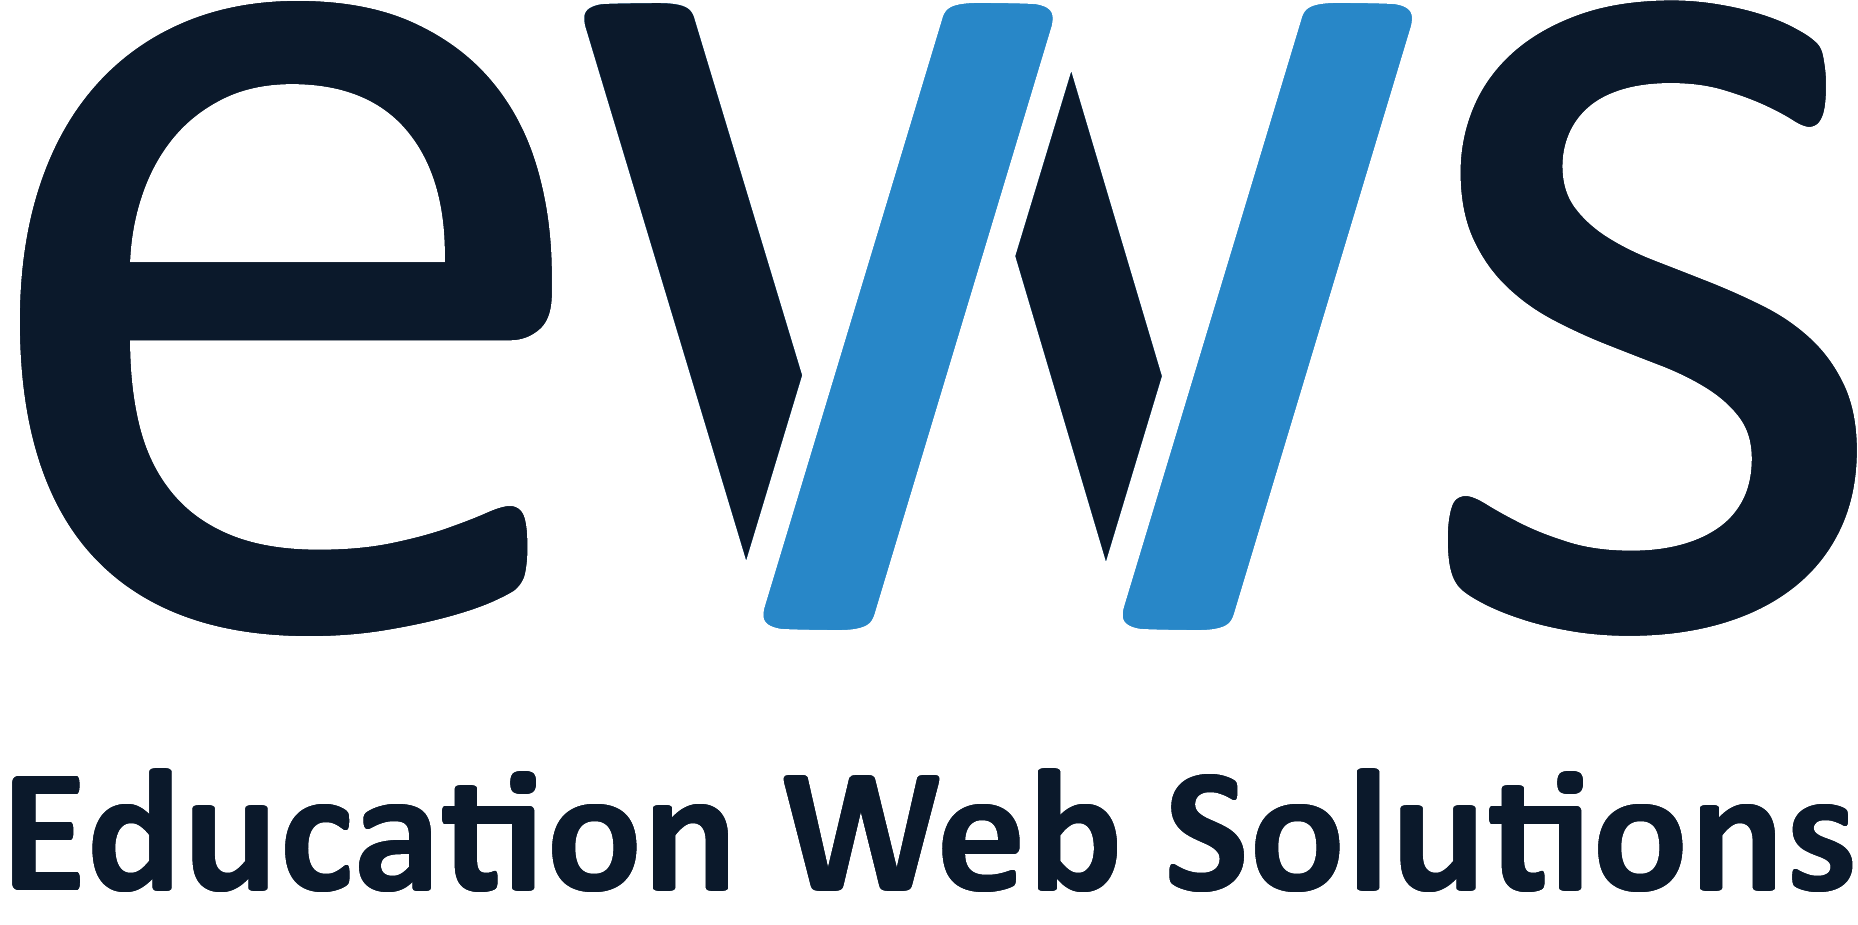 Edu Web Solutions logo